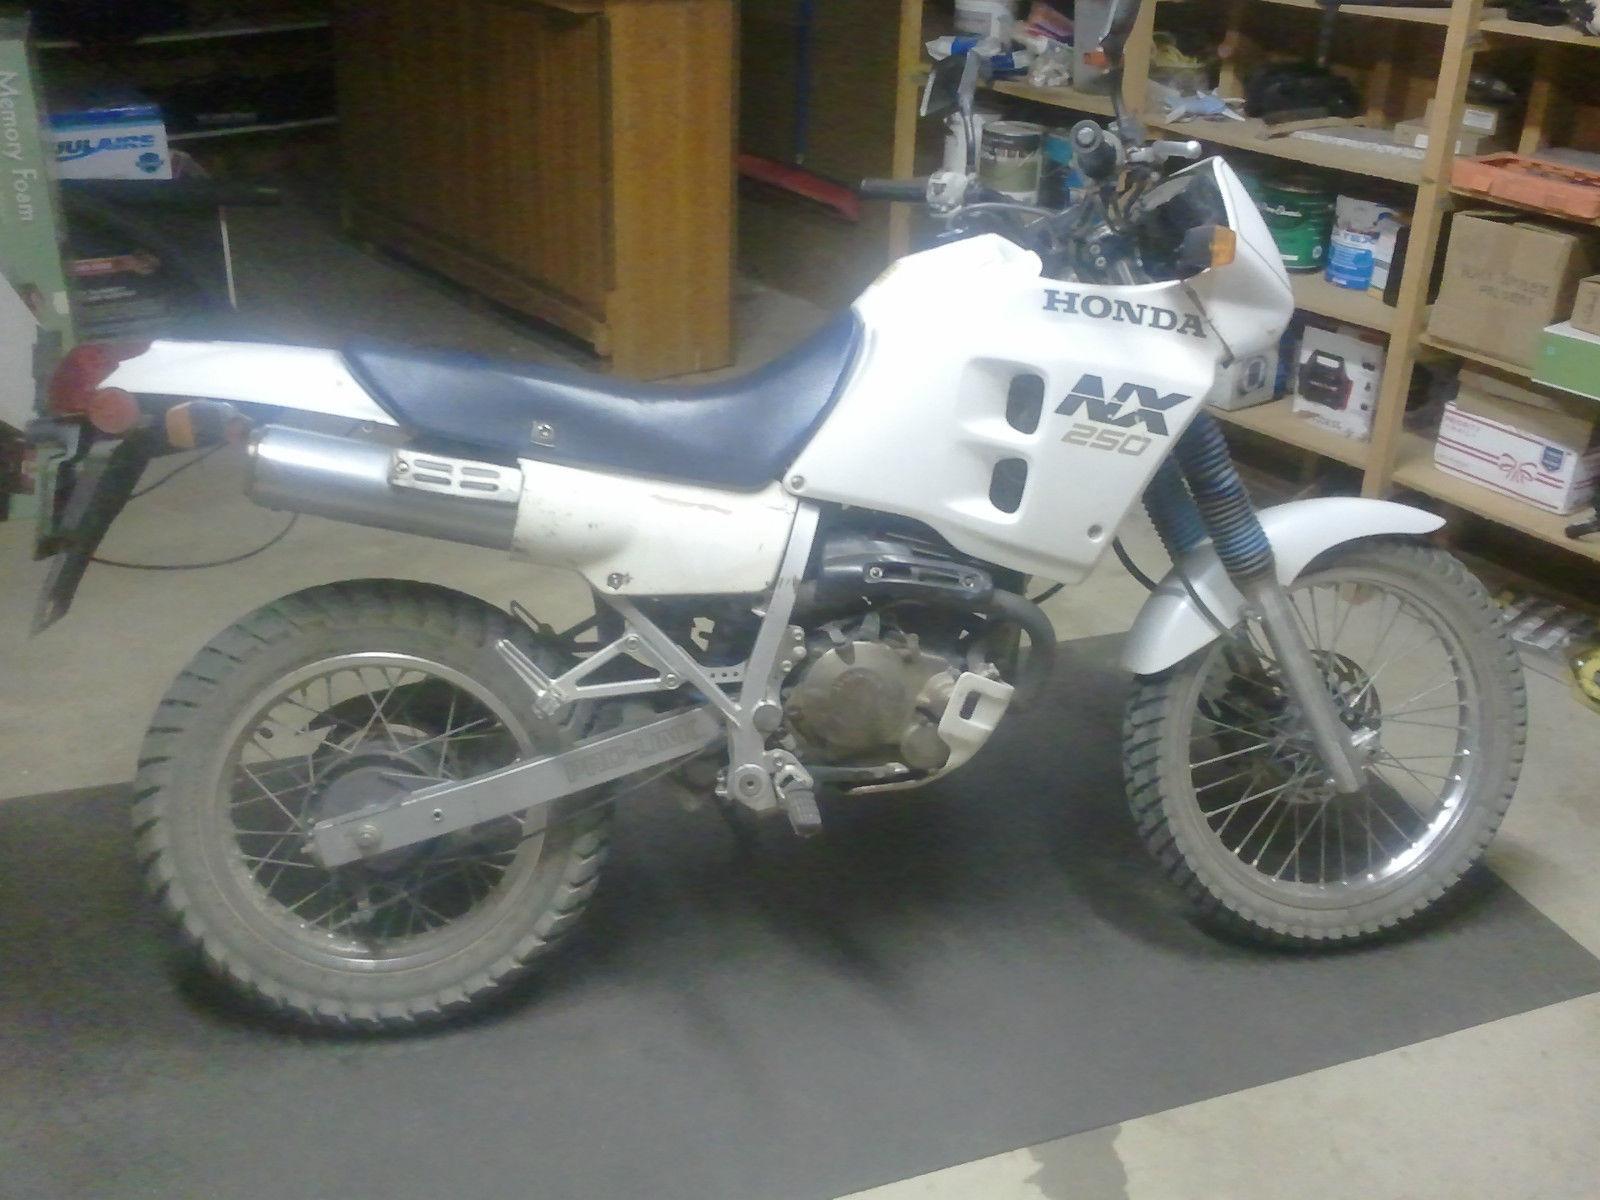 1988 Honda Nx250 Enduro Motorcycle